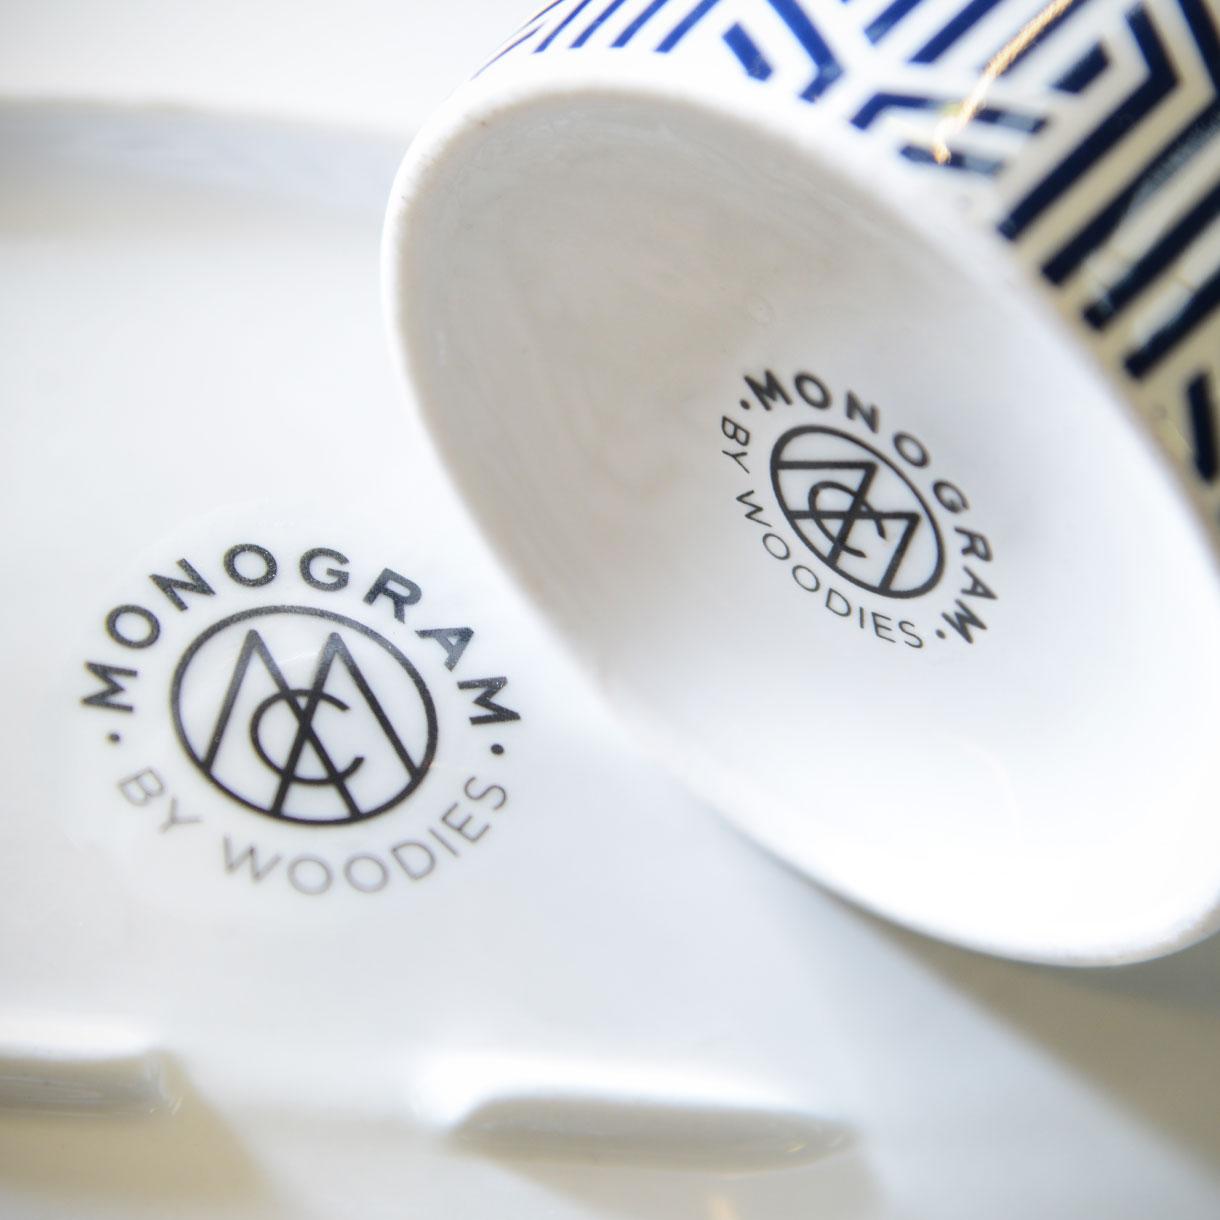 Principle brand agency Dublin Woodie's homewares brand design project monogram delph collection logo stamp